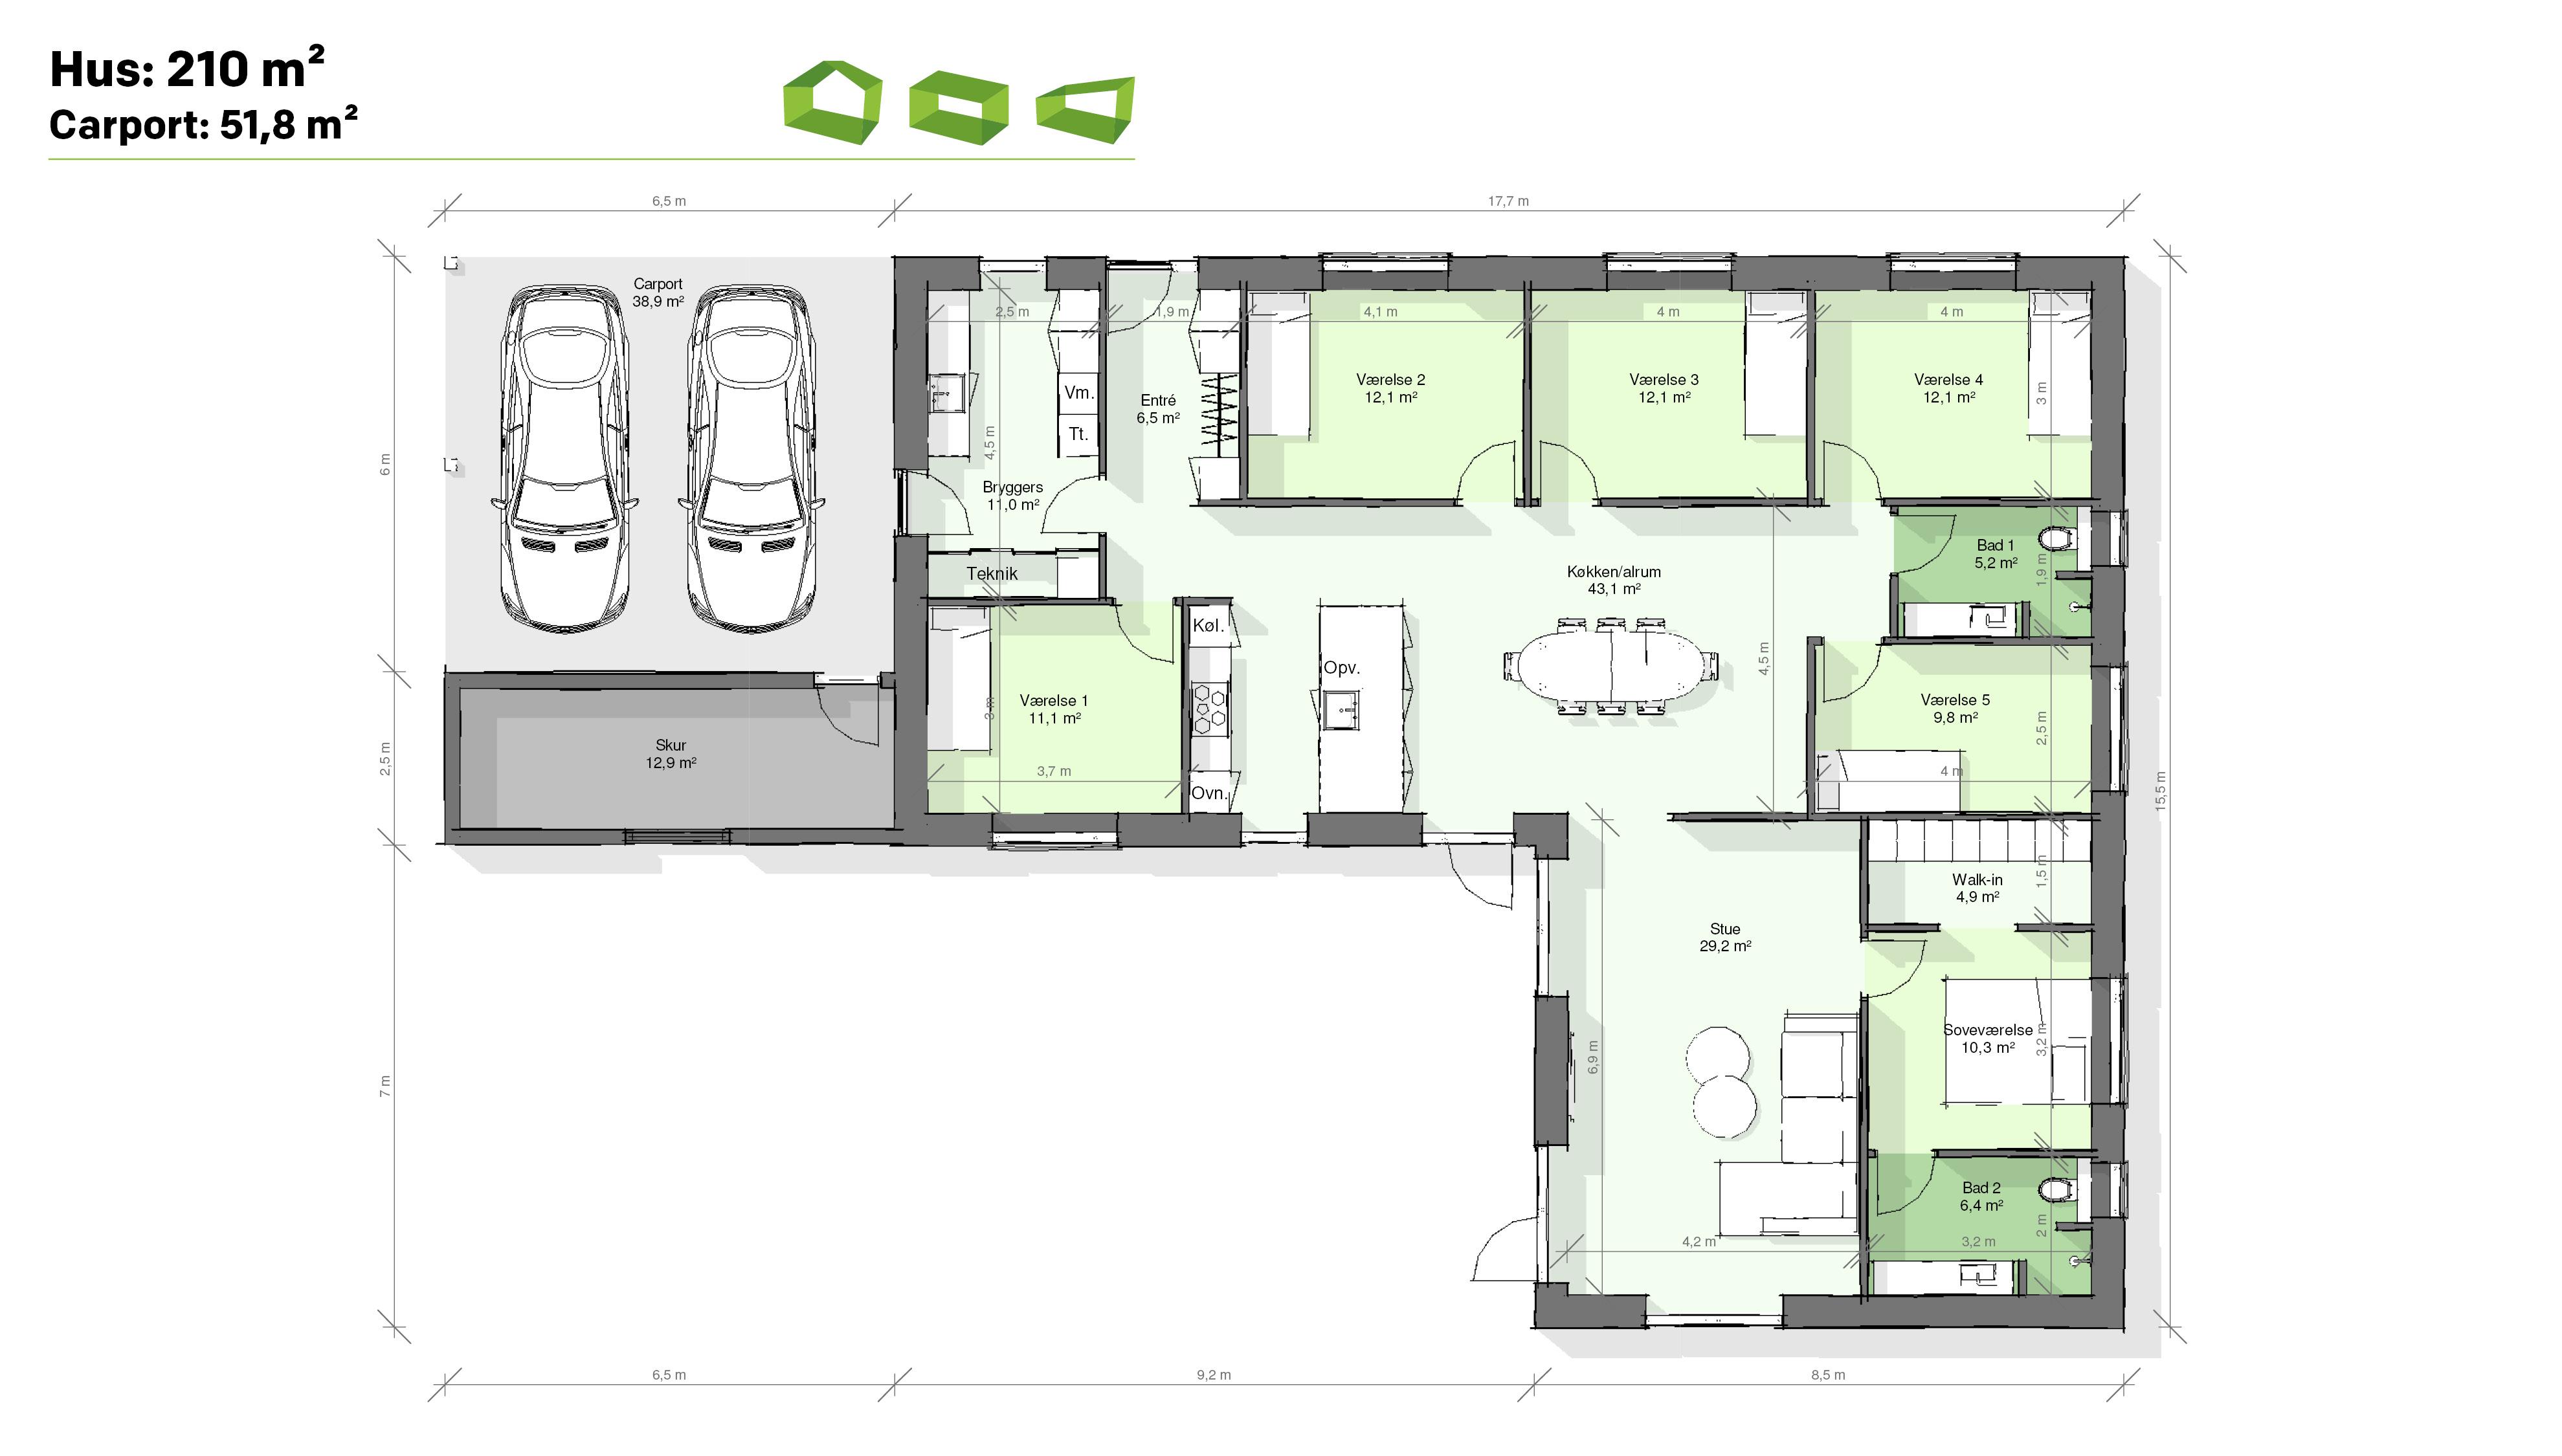 plantegning vinkelhus 210 m2